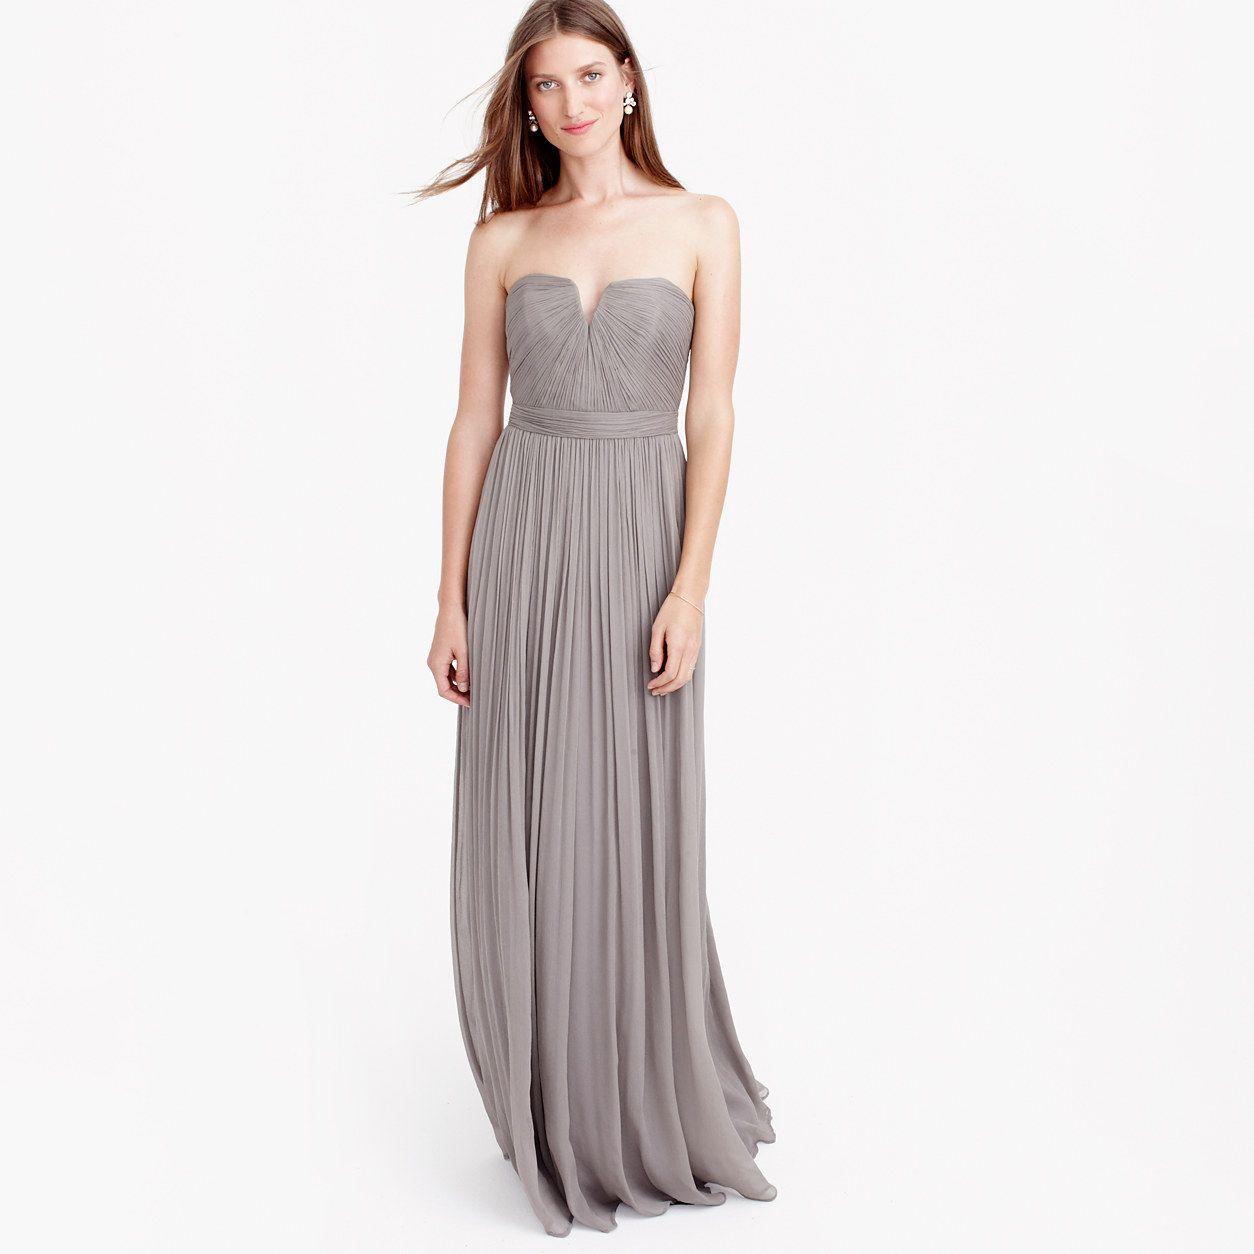 Petite nadia long dress in silk chiffon allproducts jew j crew bridesmaid dress nadia size 0 petite in graphite ombrellifo Choice Image